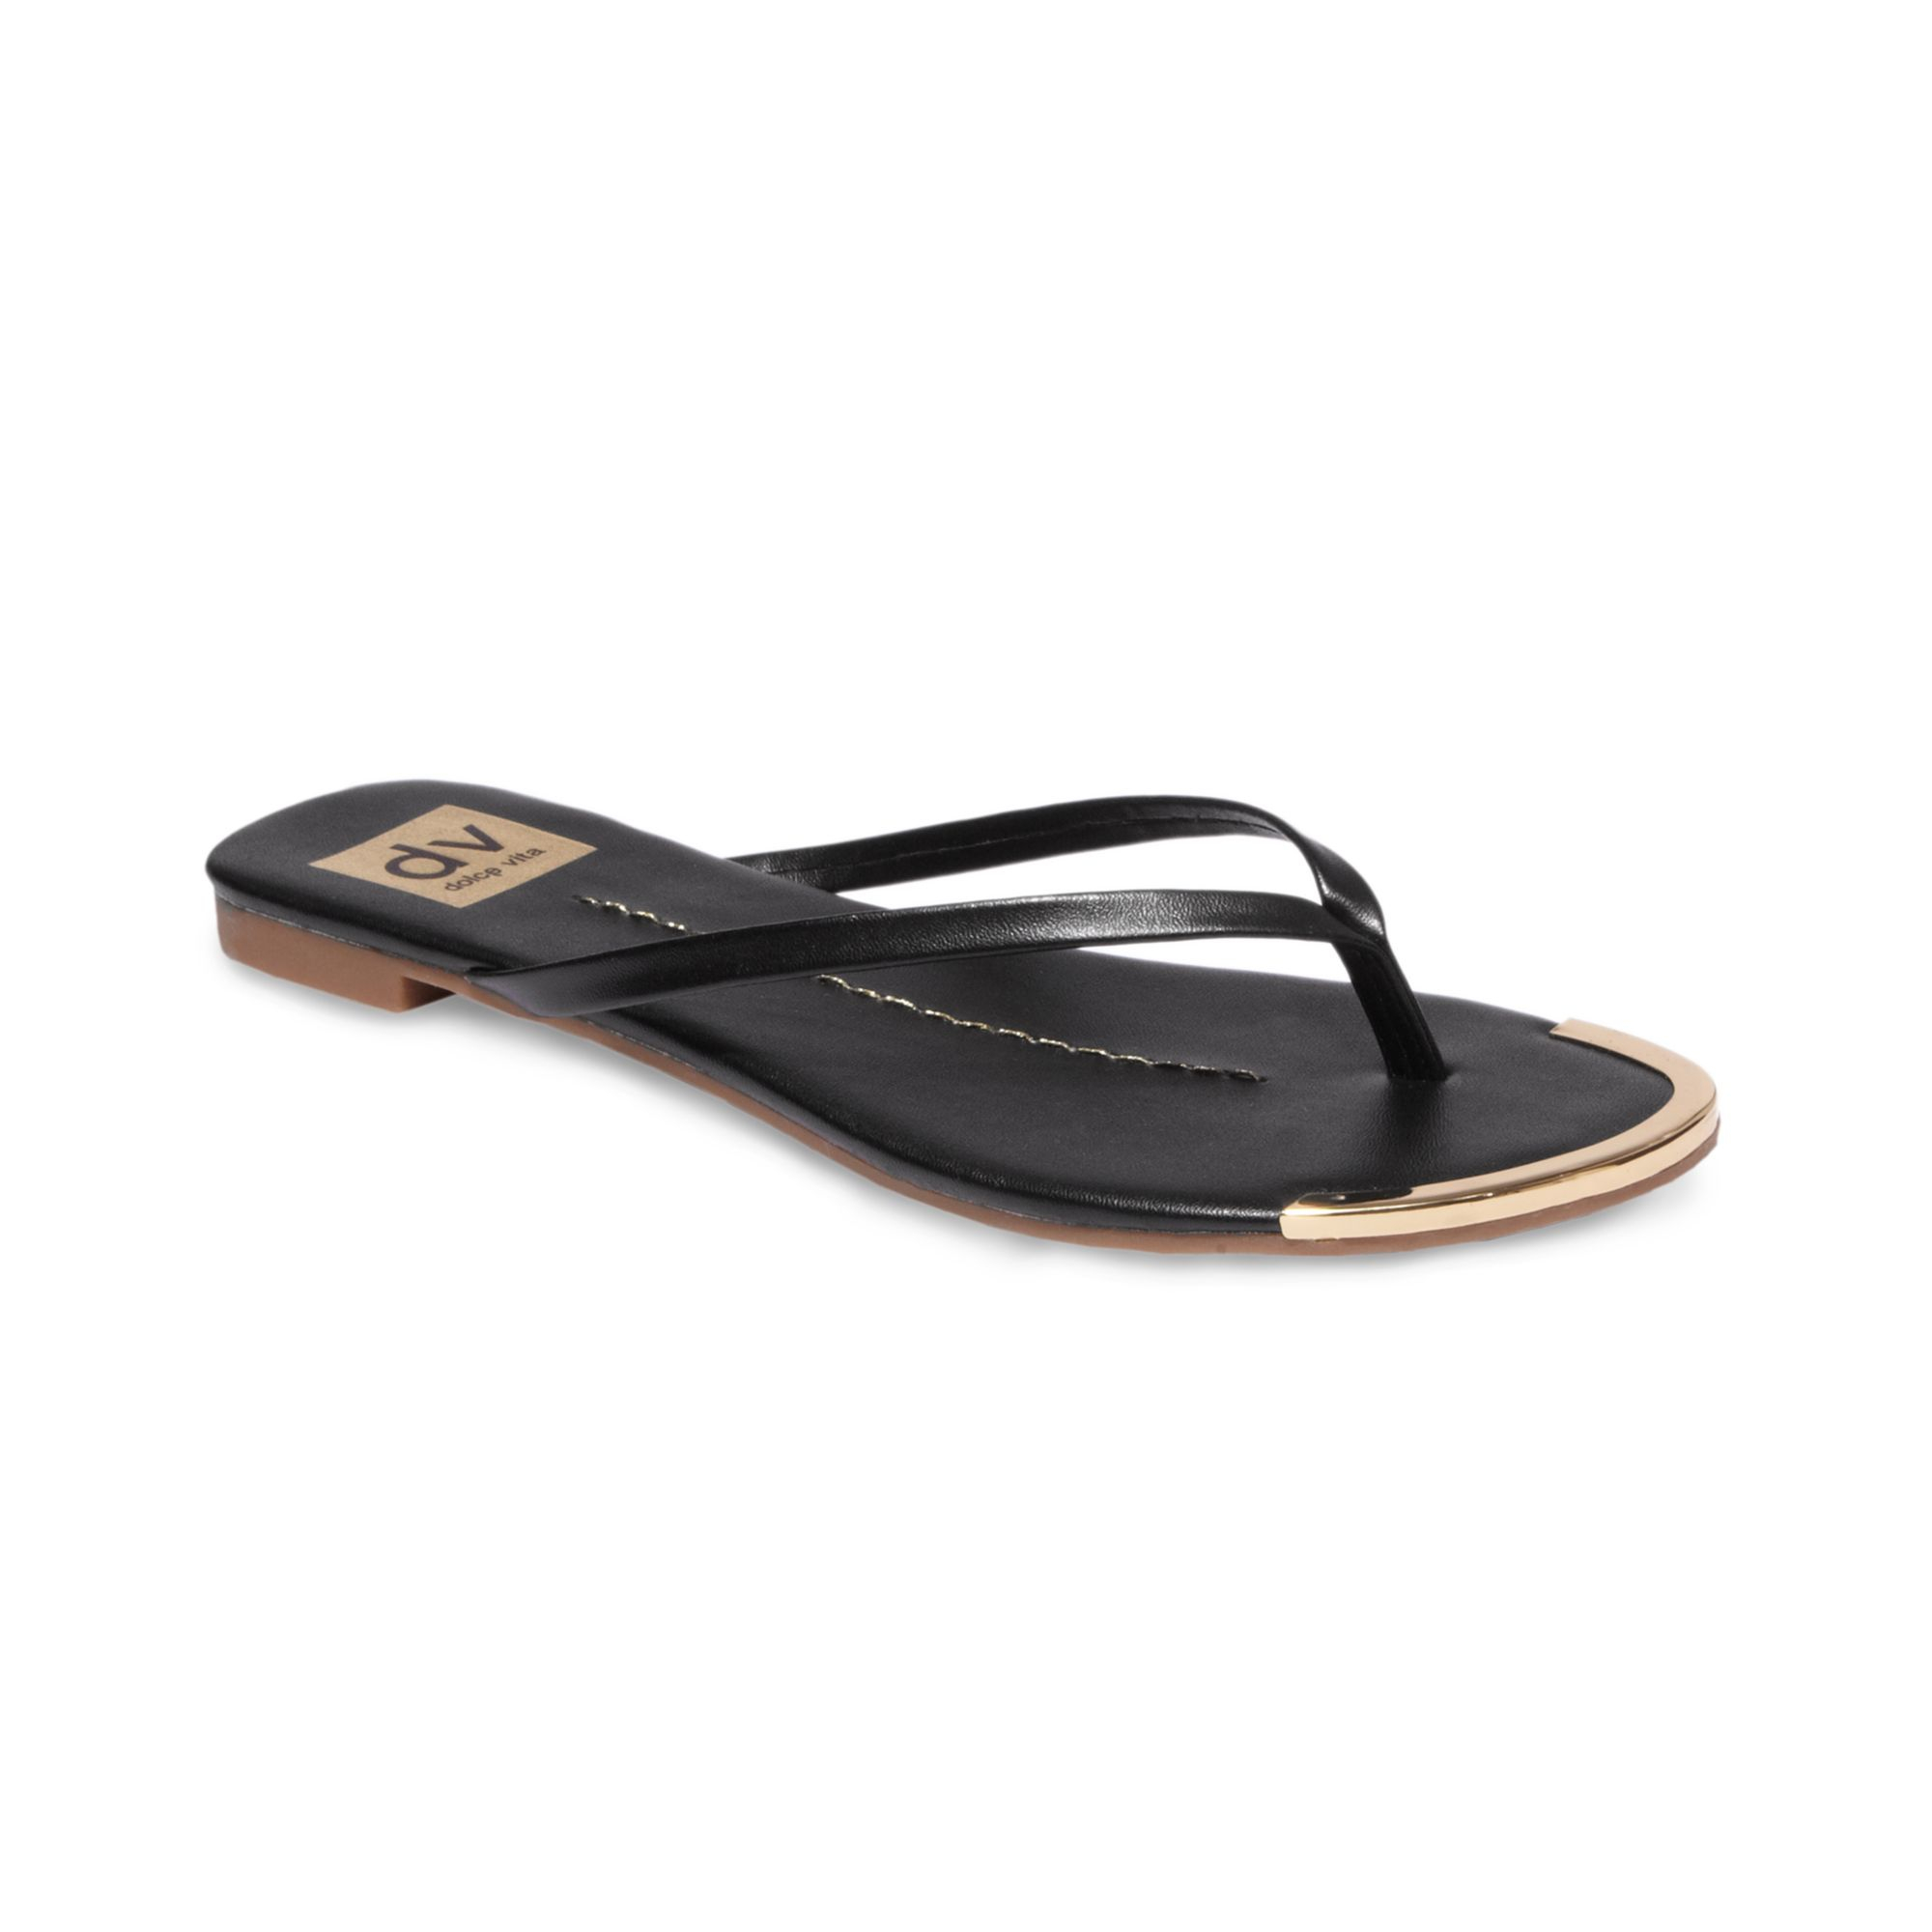 76cda859bb5 Lyst - Dolce Vita Dania Thong Sandals in Black